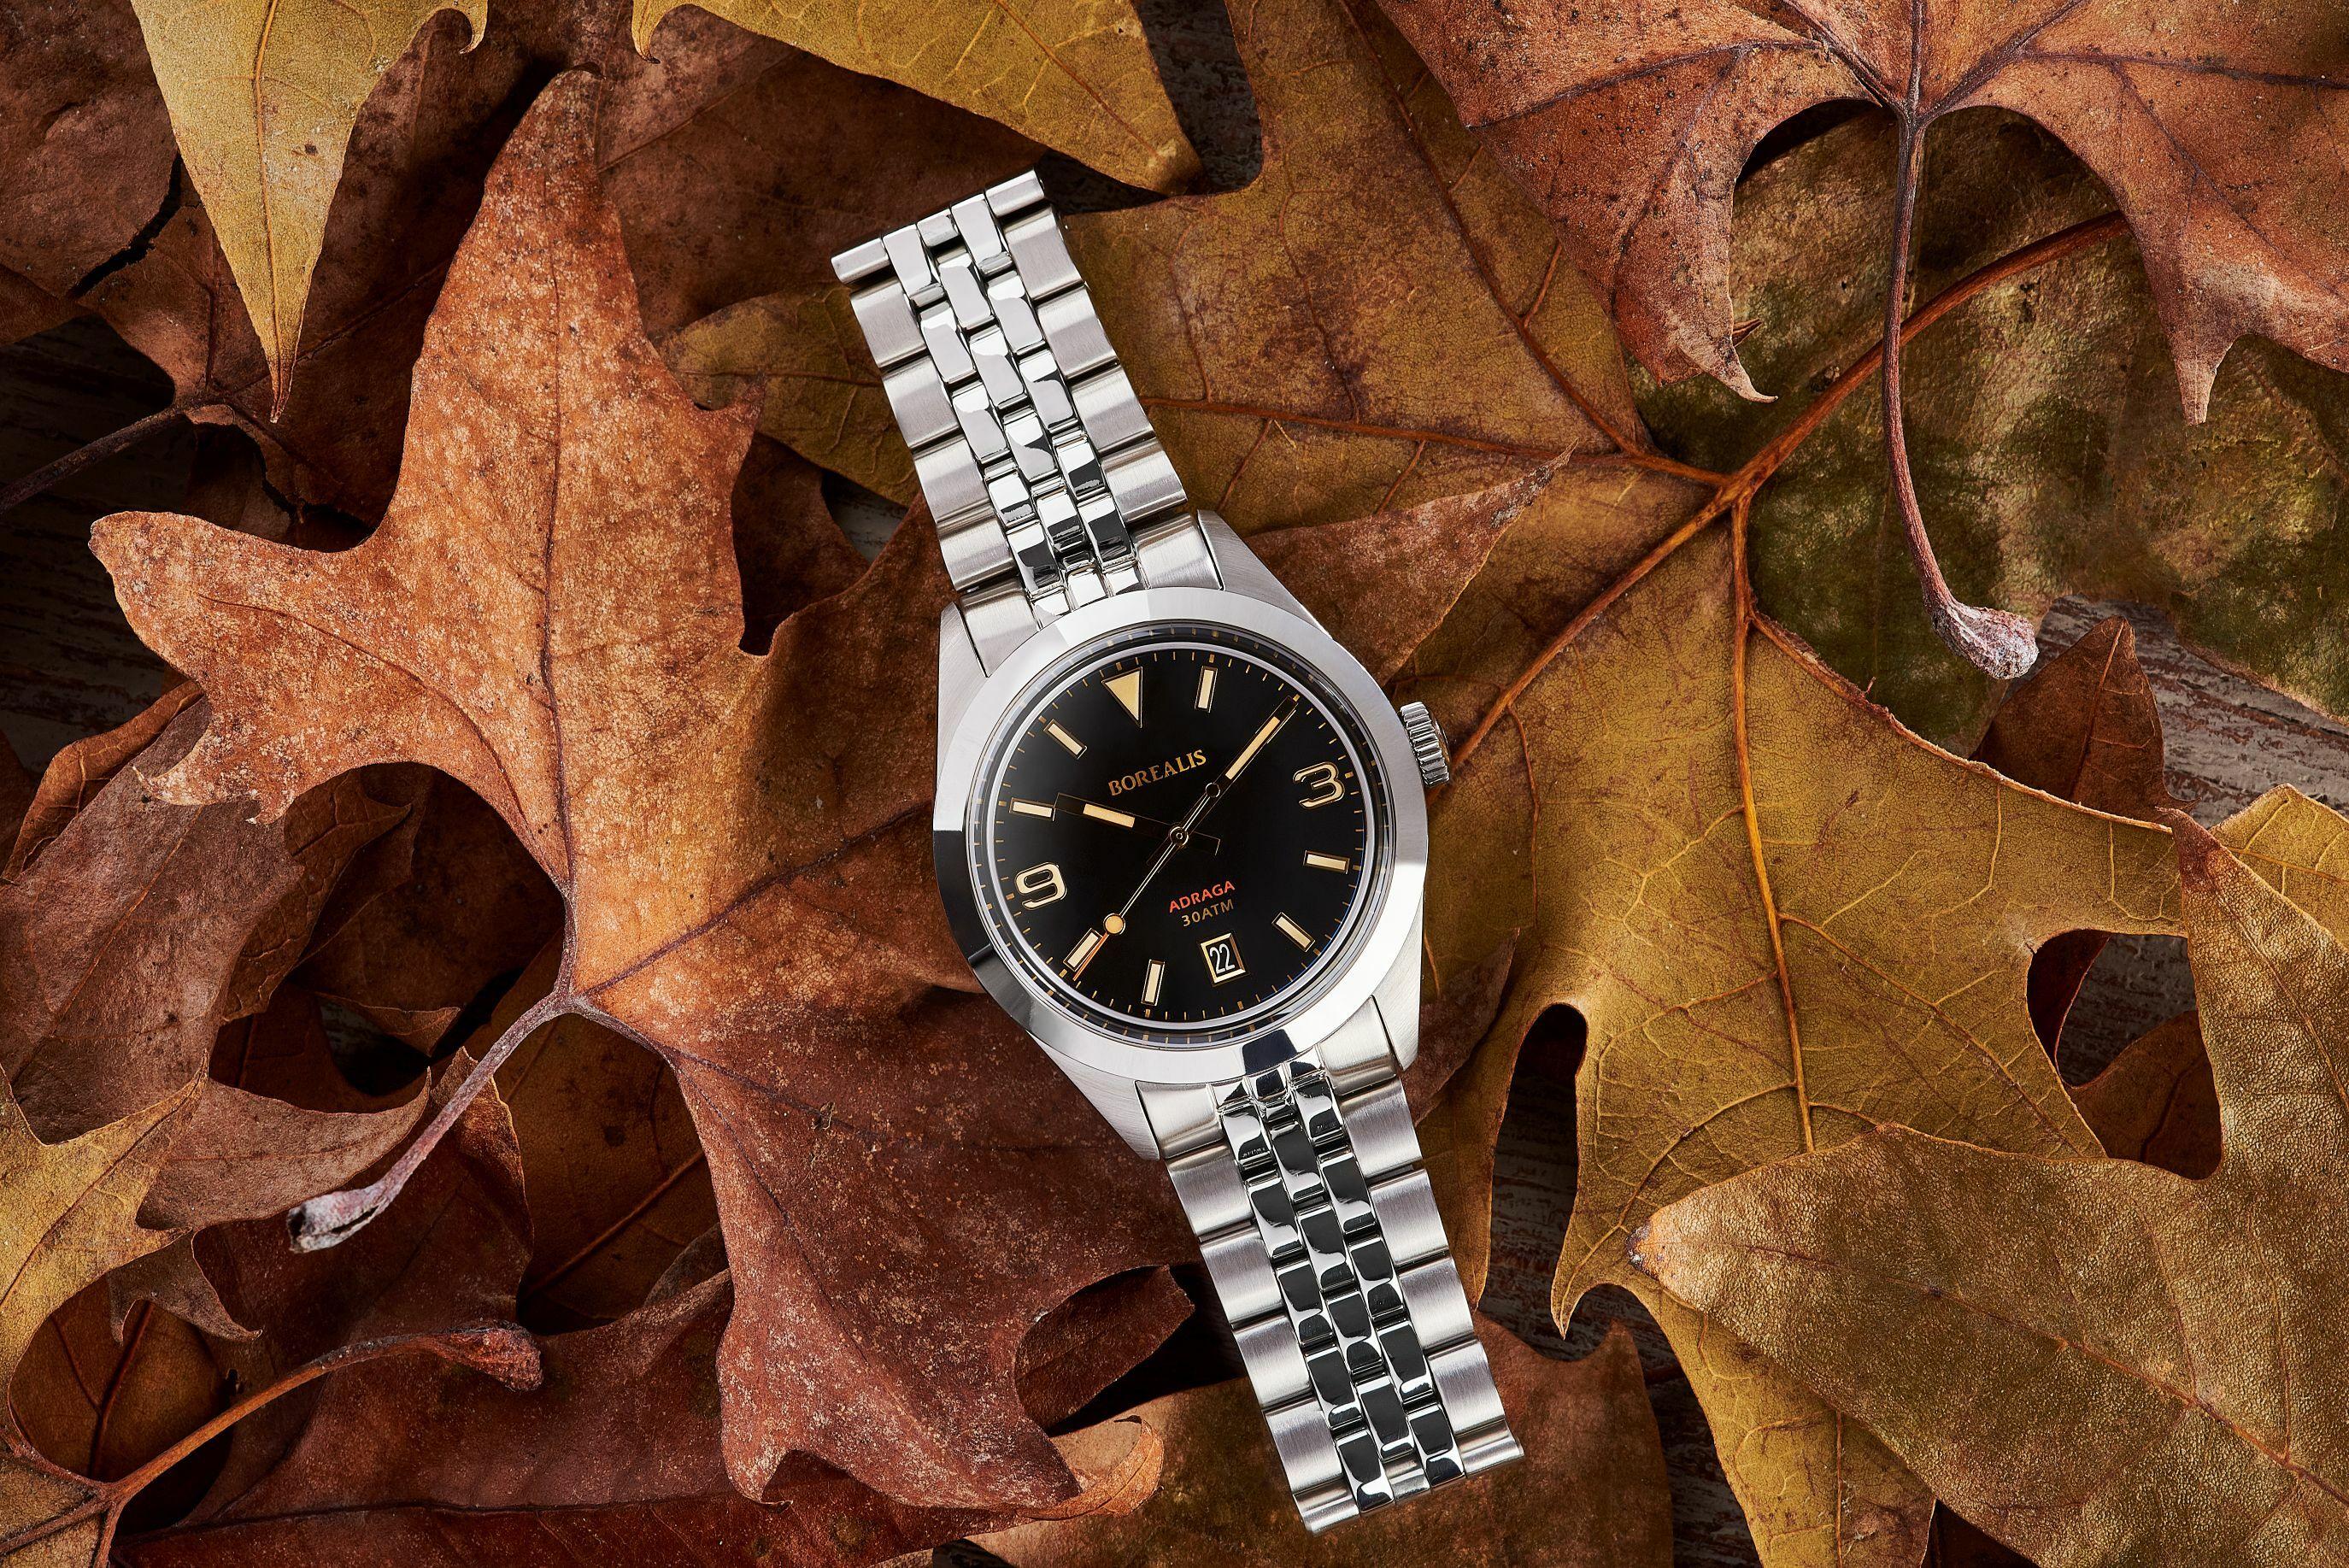 Borealis Adraga Stainless Steel Miyota 9015 black dial Commando Hands Date Old Radium Lume